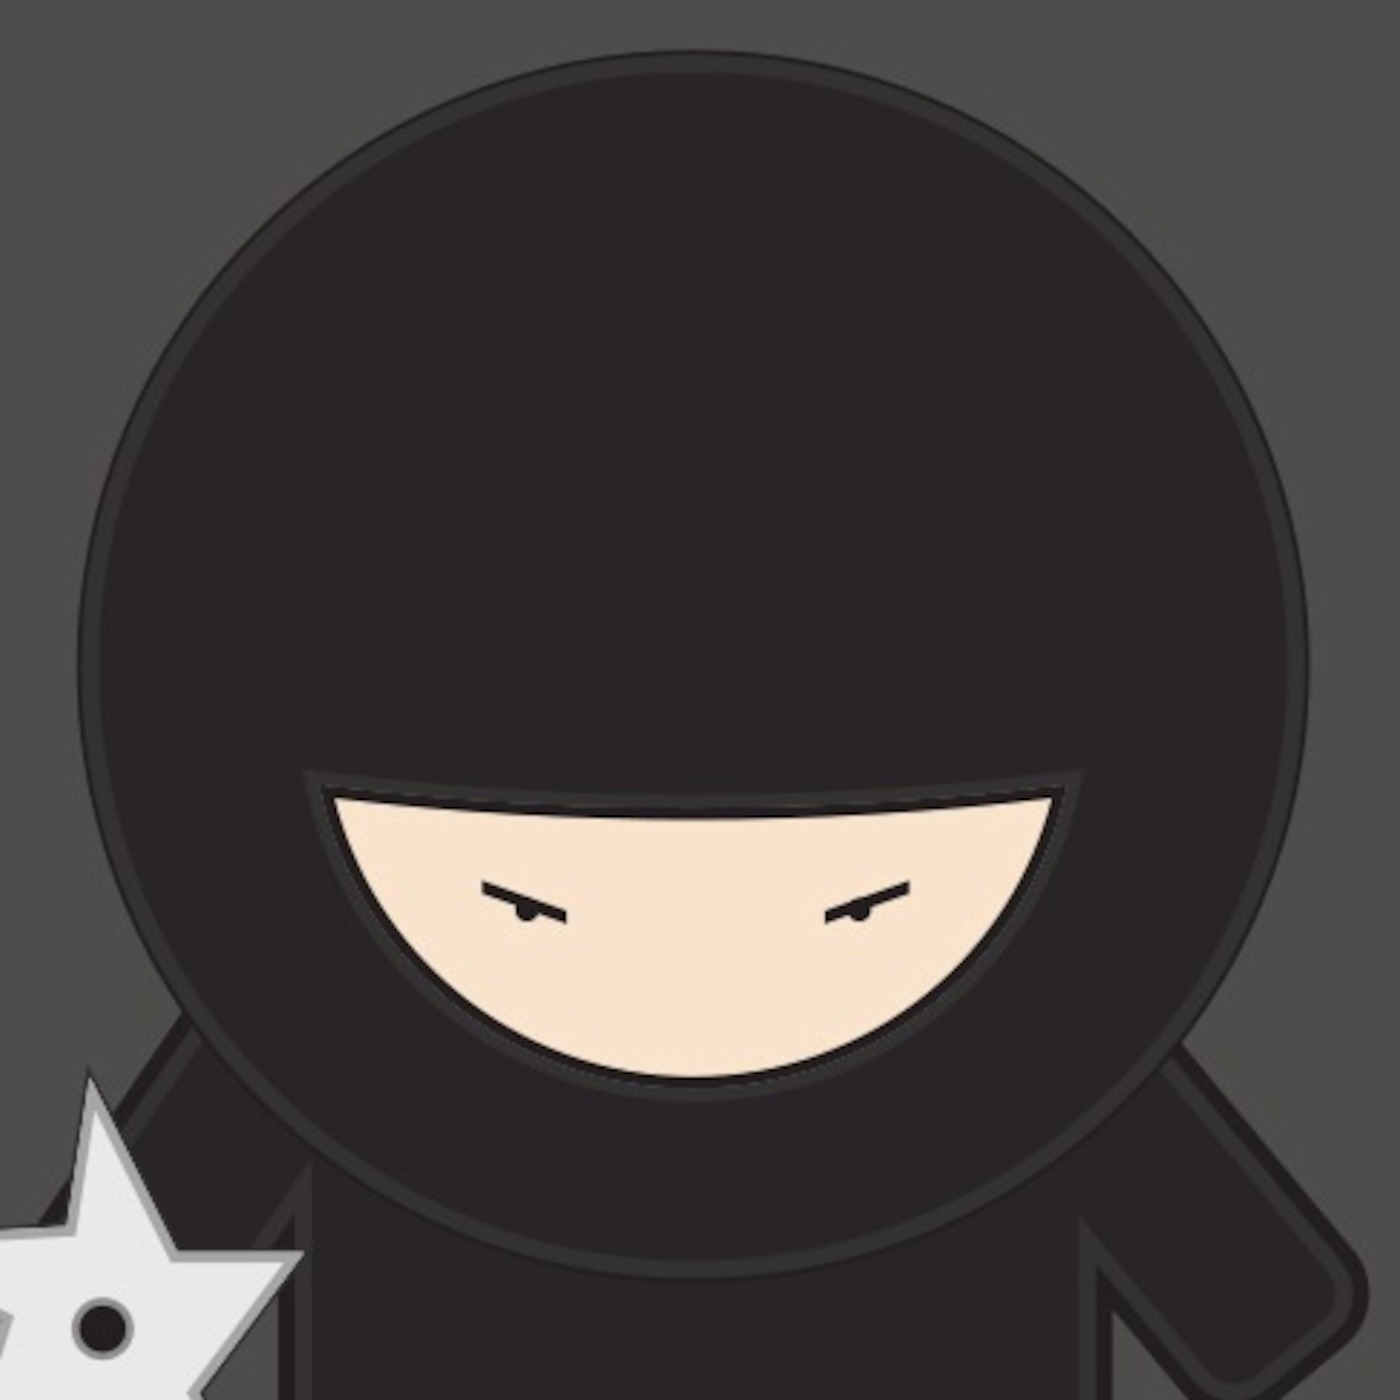 Ninjasending 4